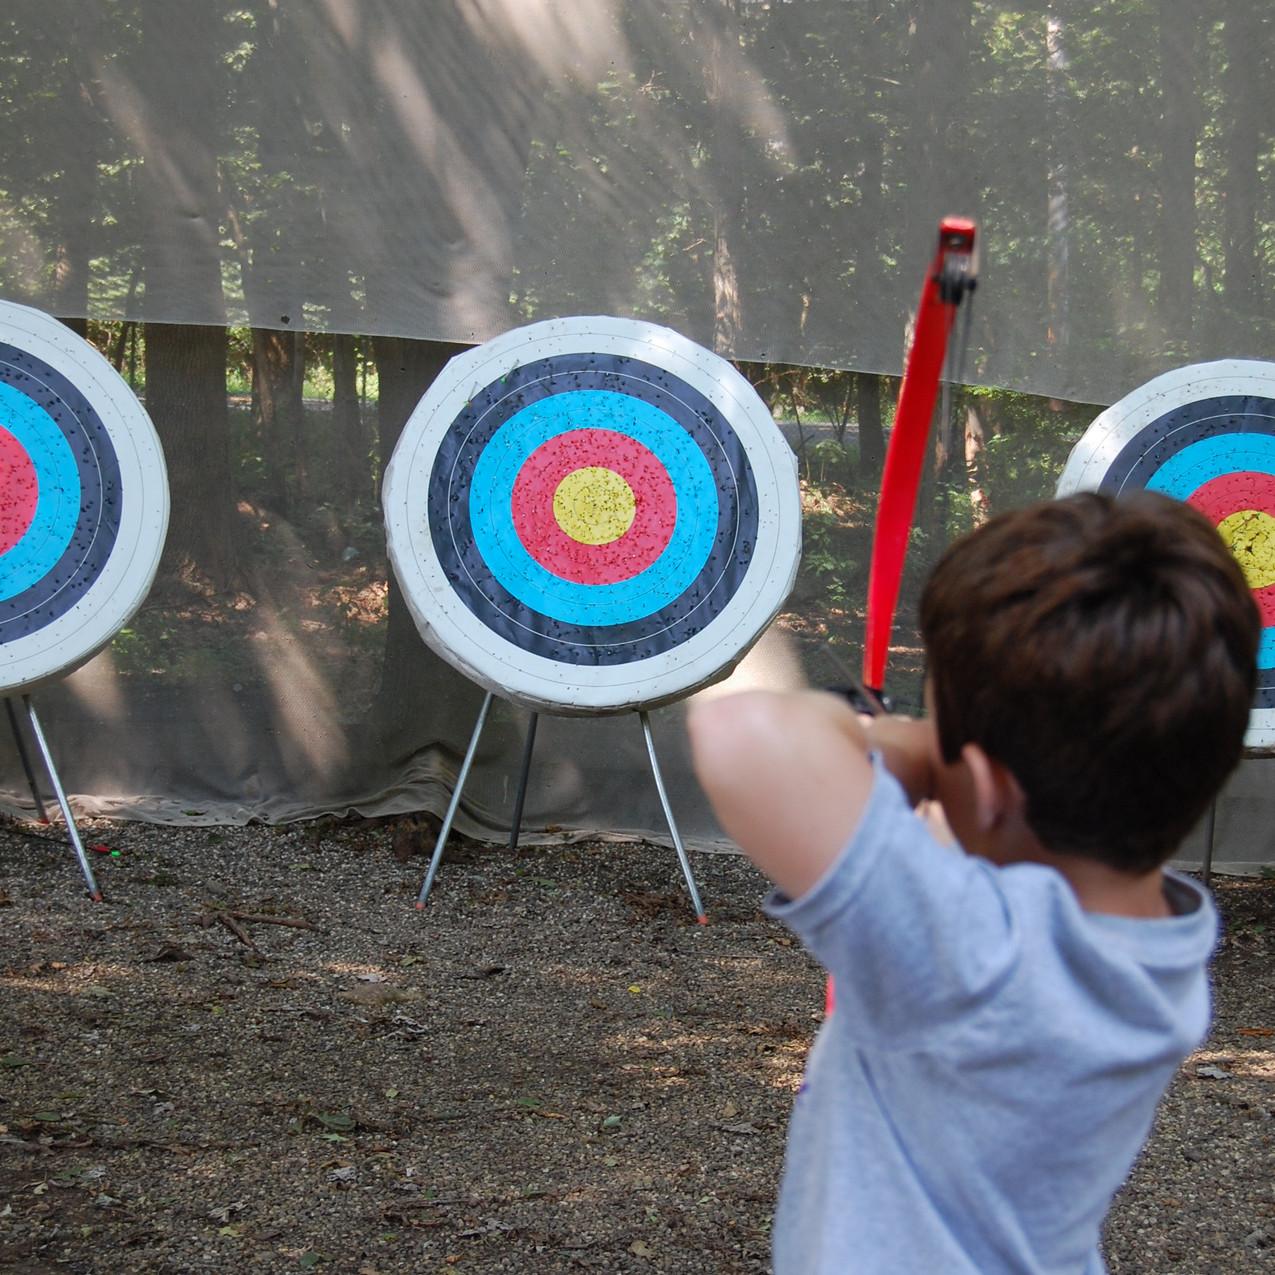 boy archery target